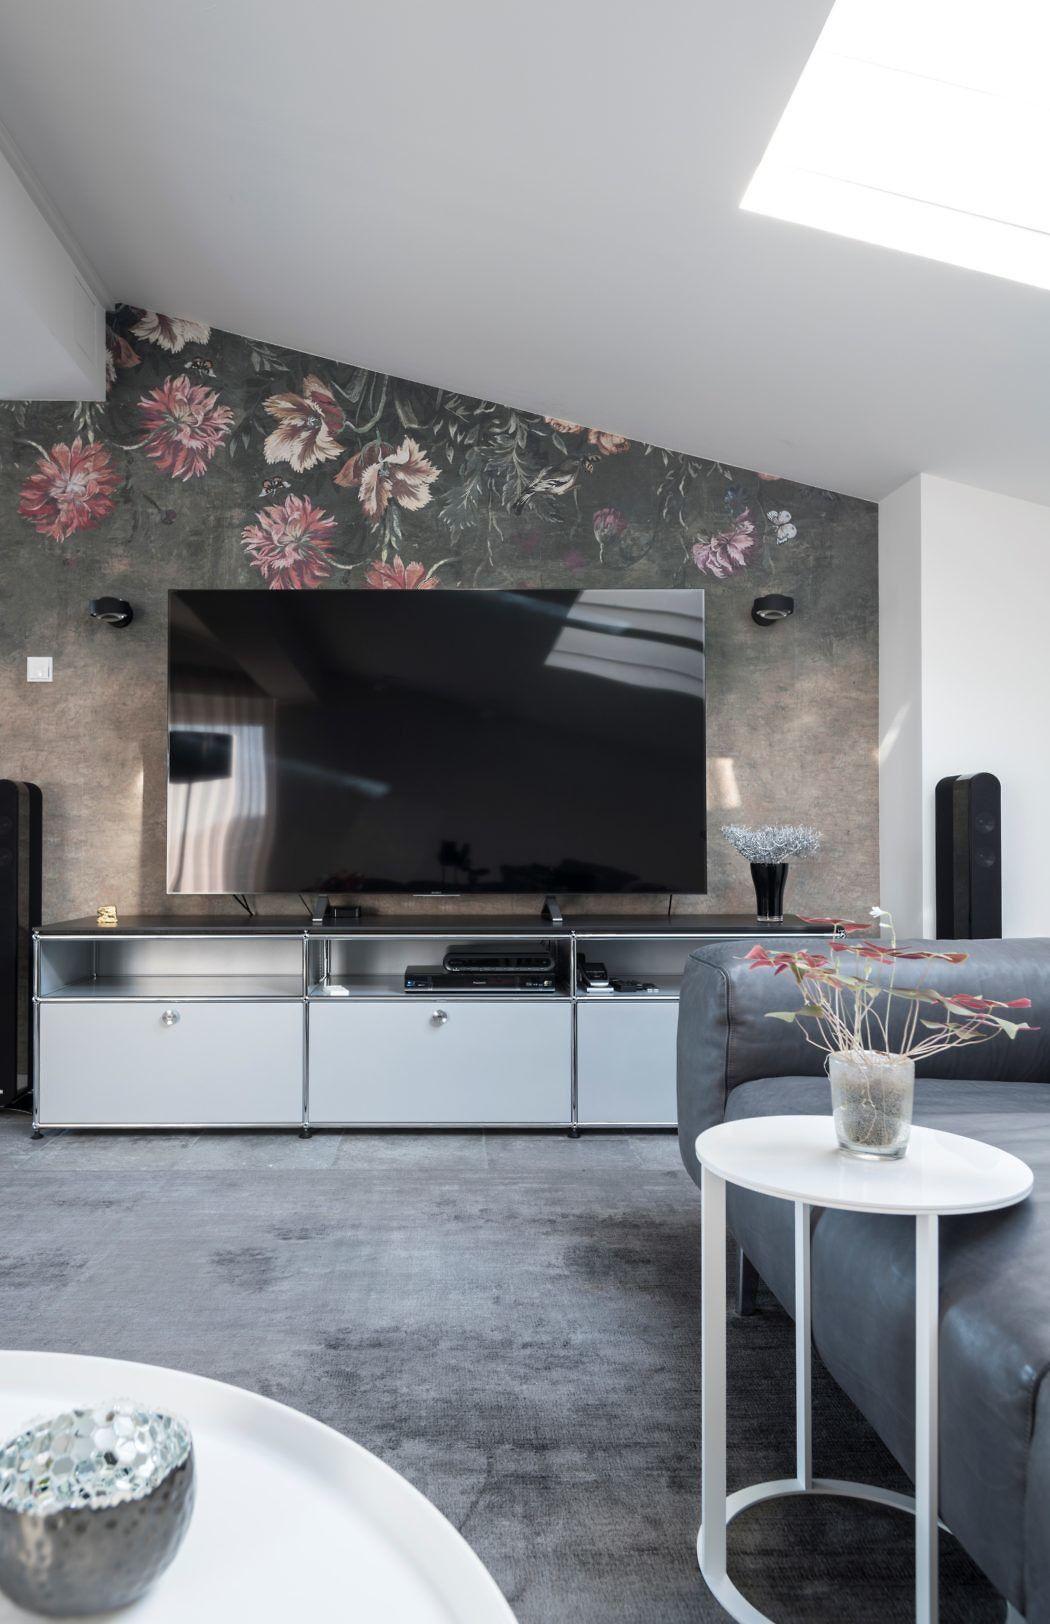 Penthouse In Nuremberg By Designfunktion Nurnberg Living Room Designs Home House